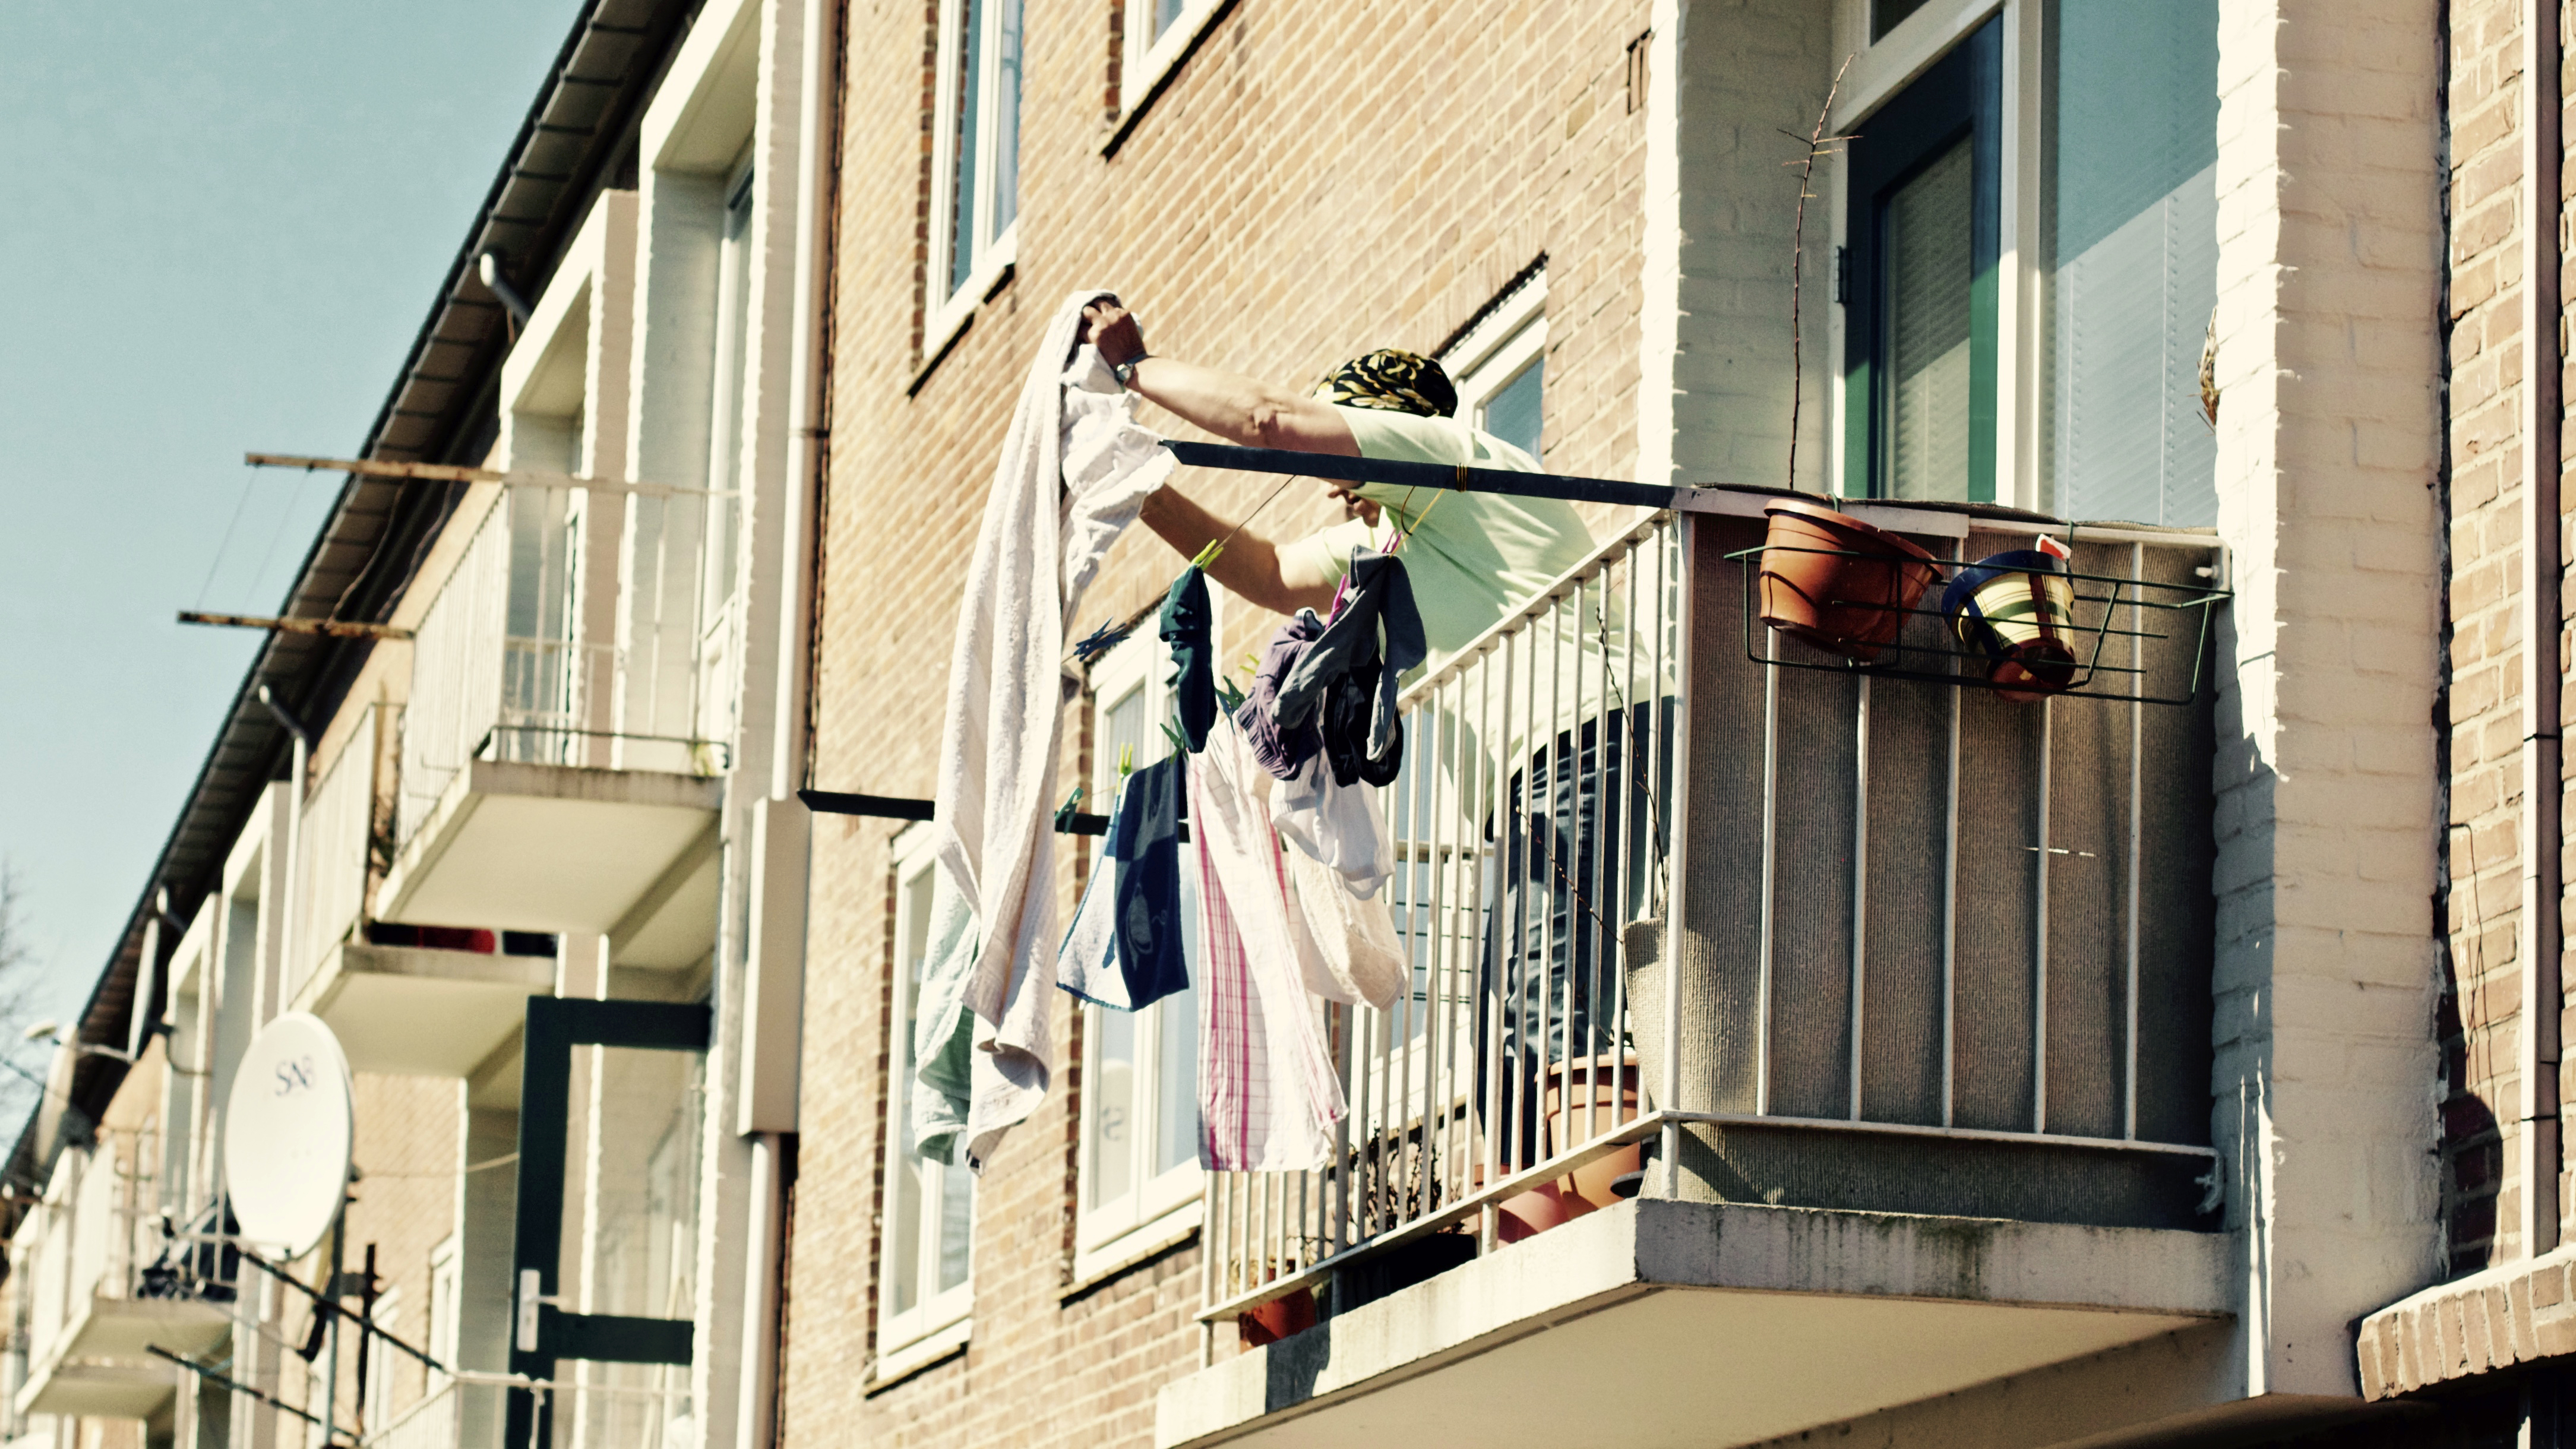 Free stock photos of balcony · Pexels